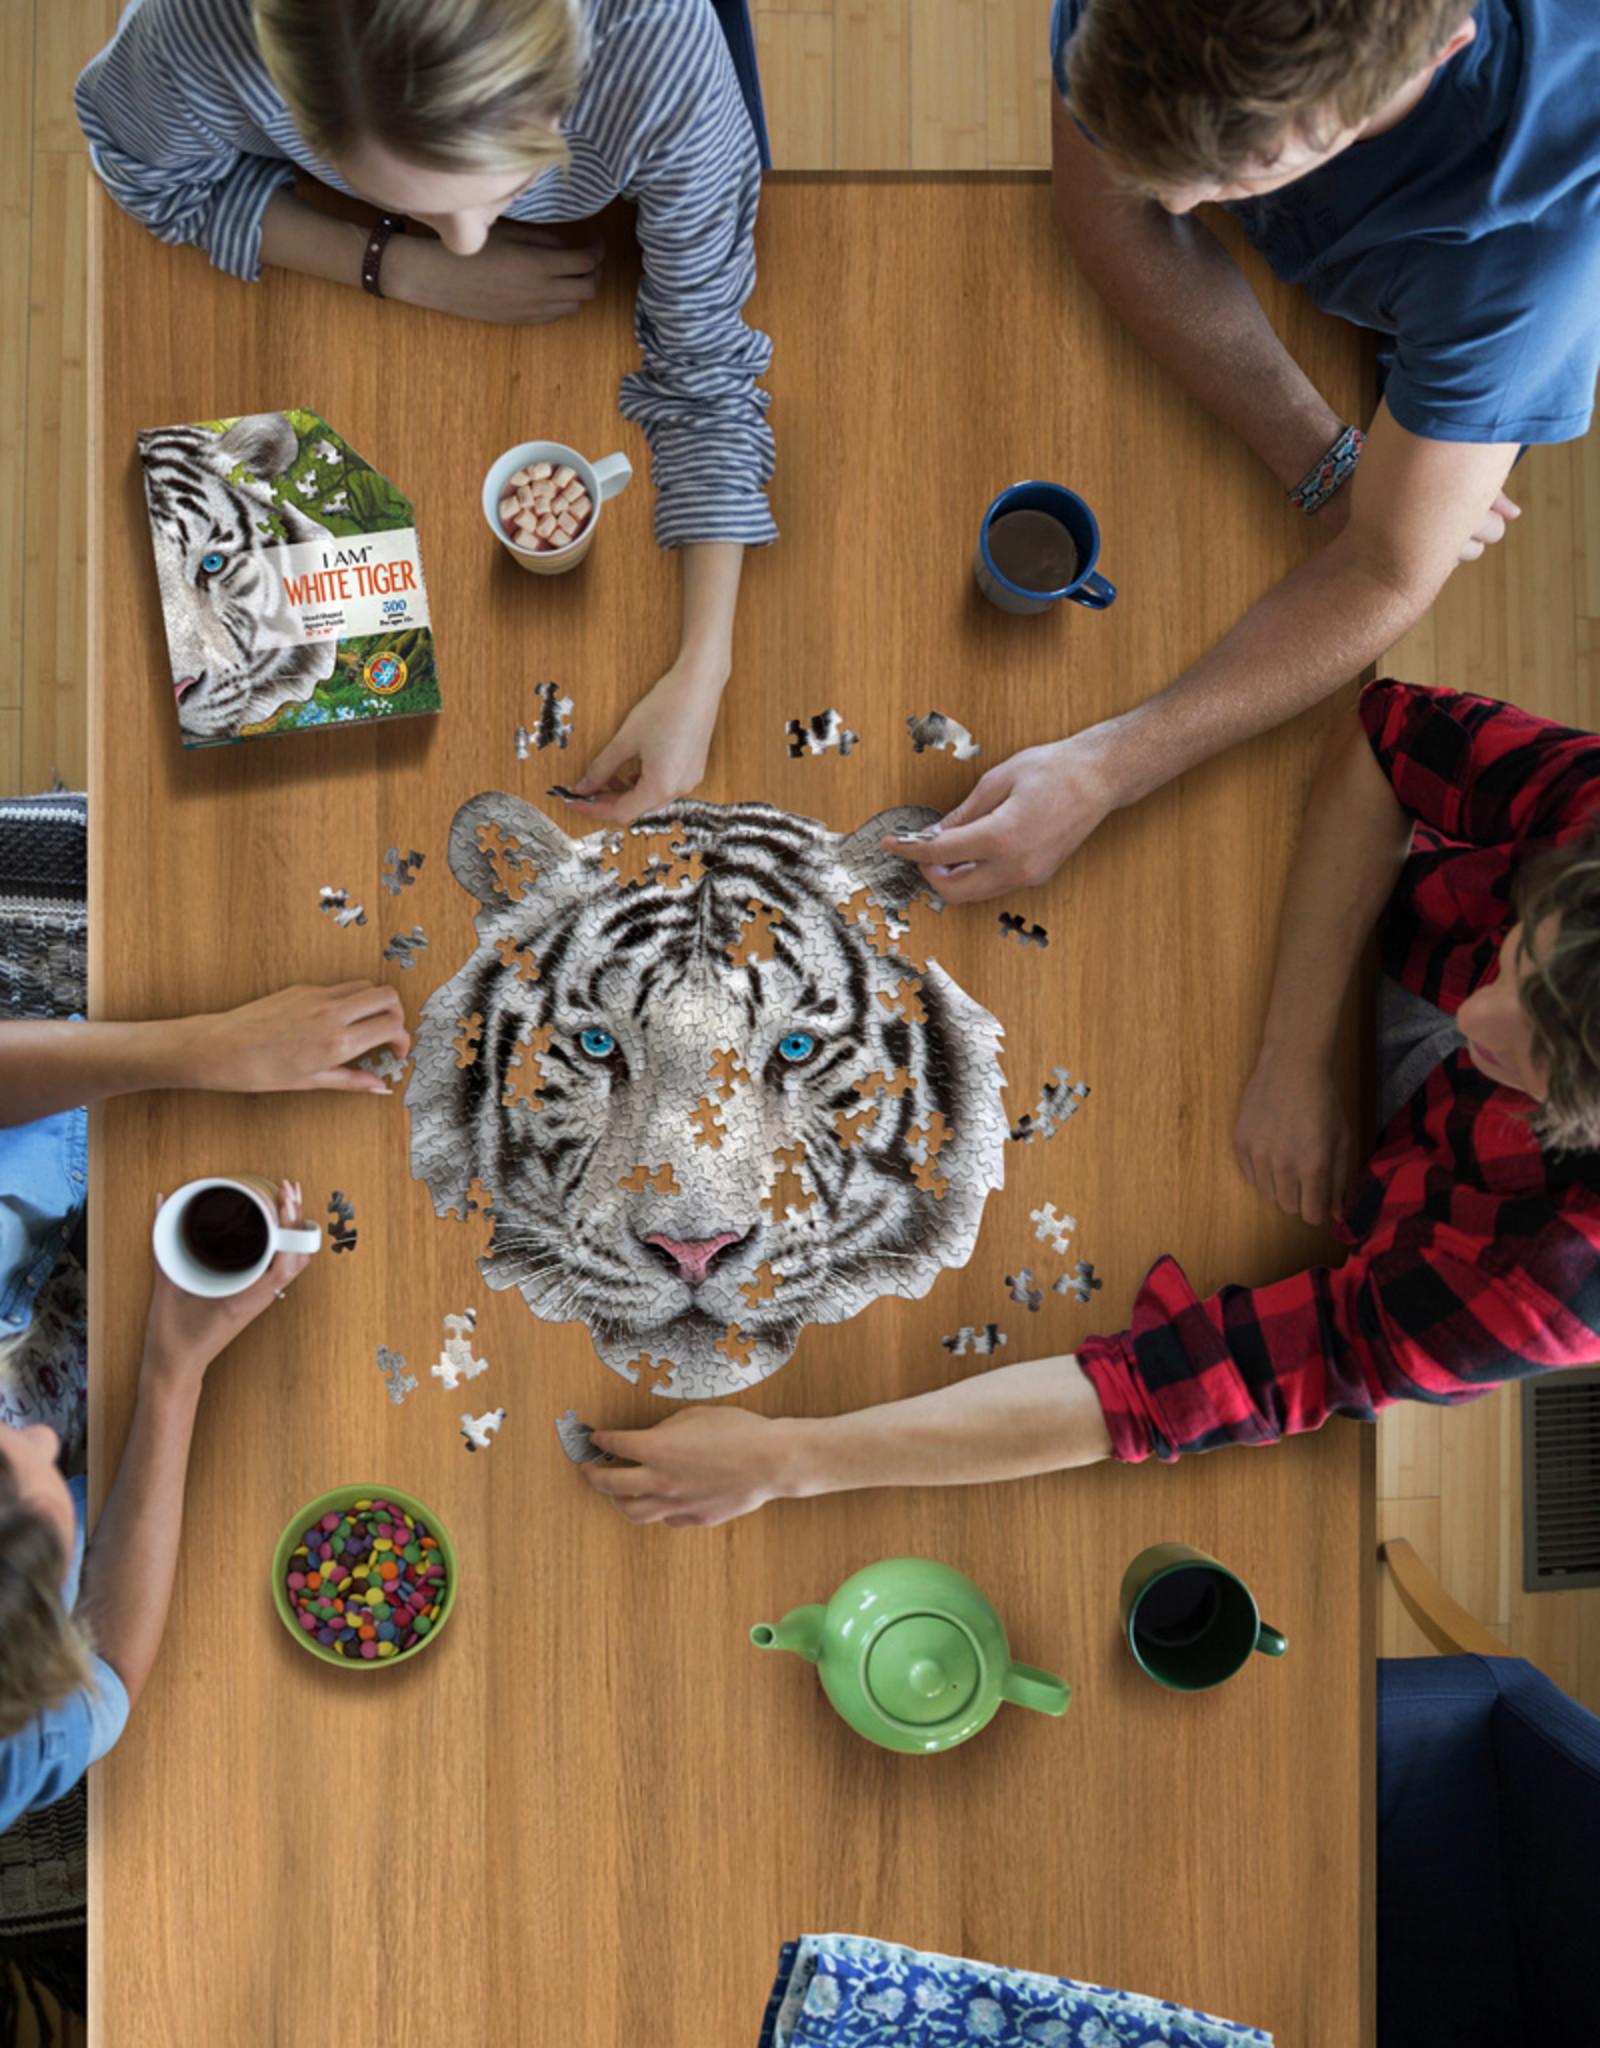 Puzzel I'am Witte Tijger 10jaar-300pcs.